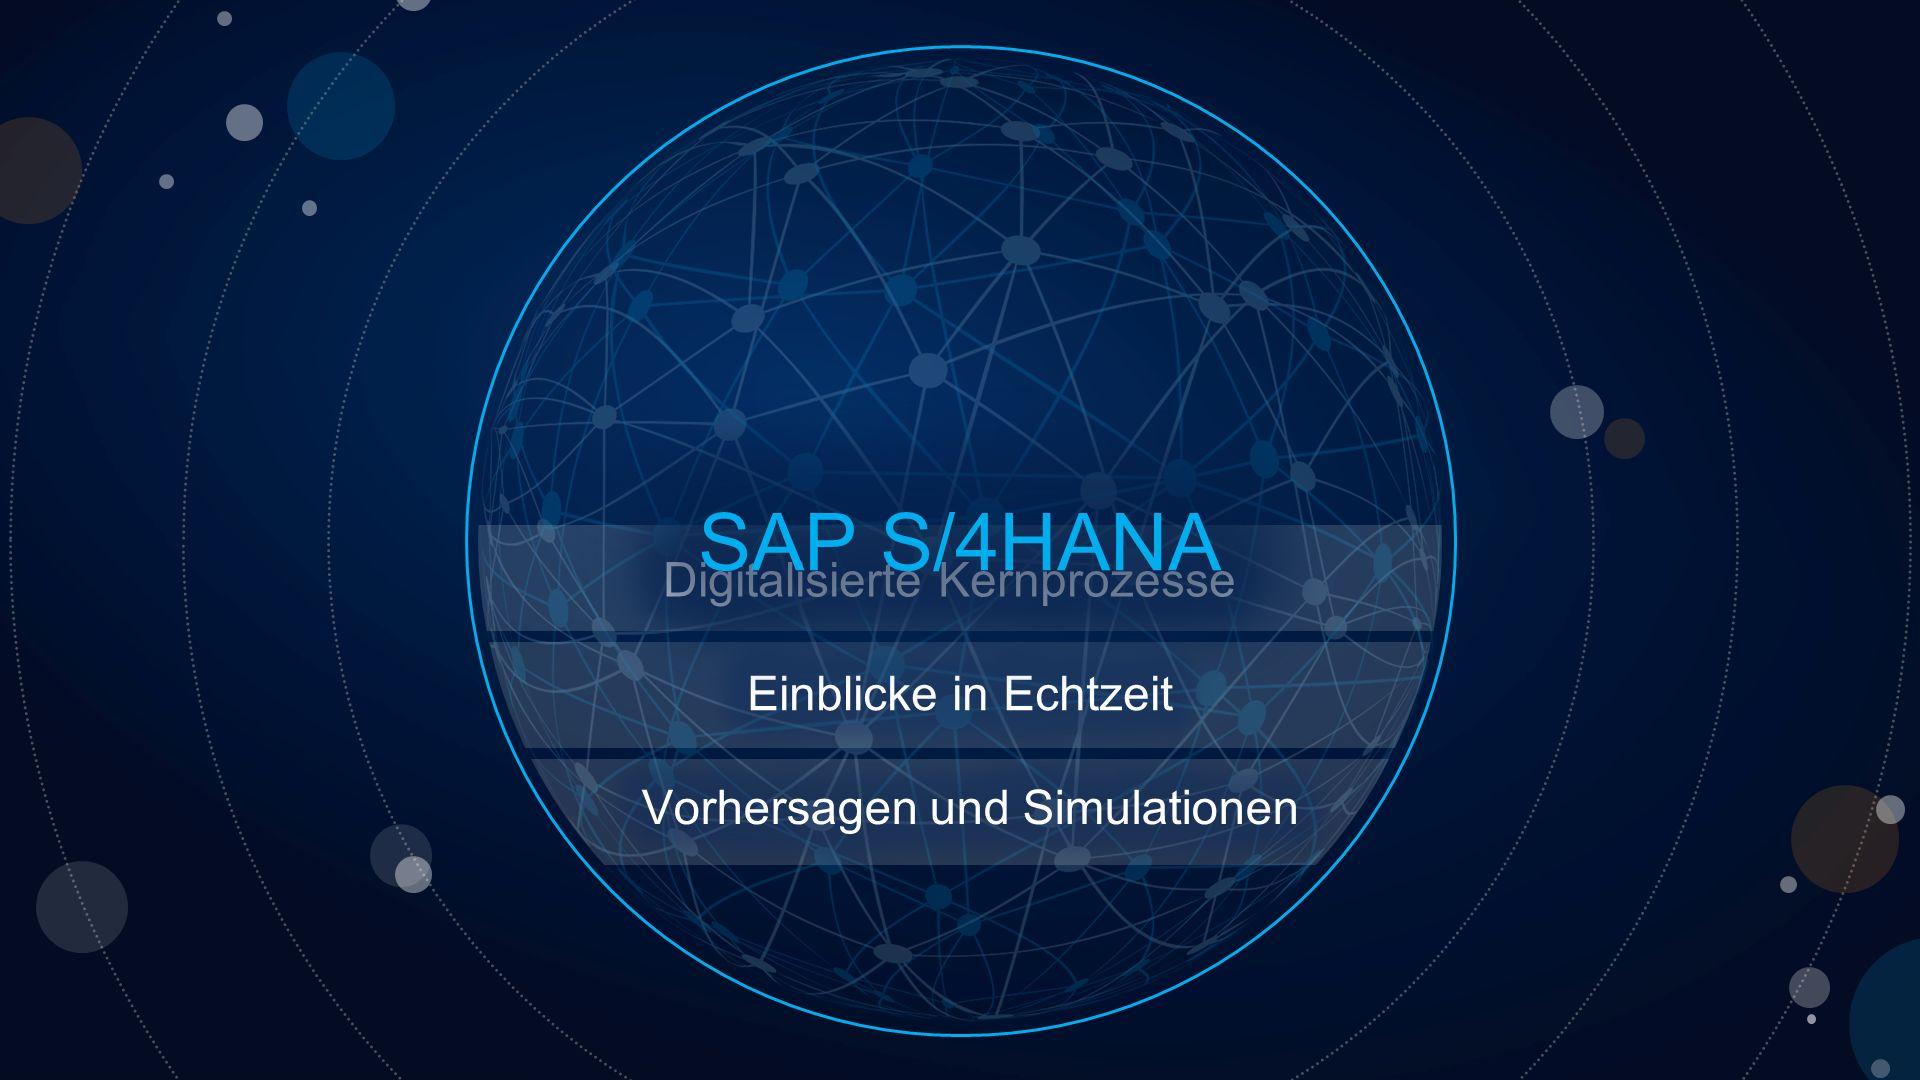 SAP S/4HANA Digitalisierte Kernprozesse Einblicke in Echtzeit